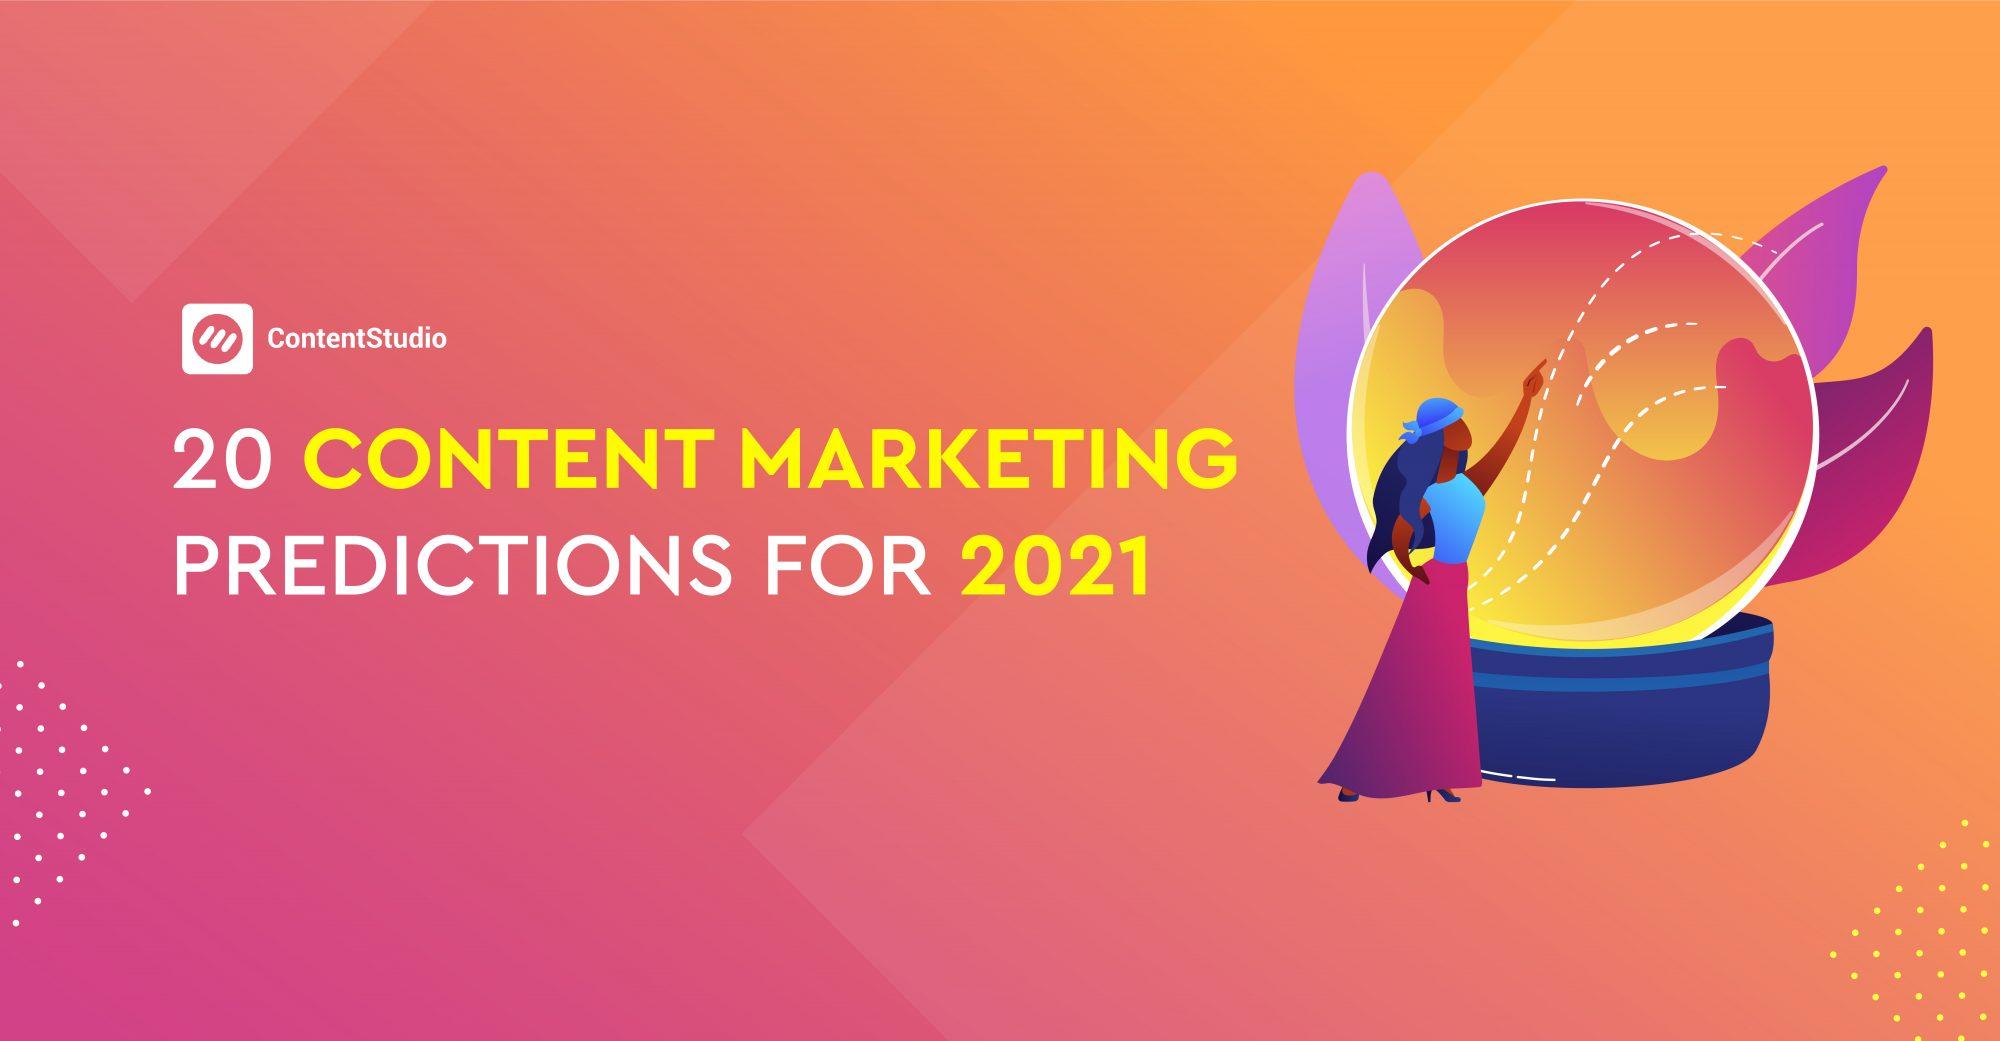 2021 content marketing predictions